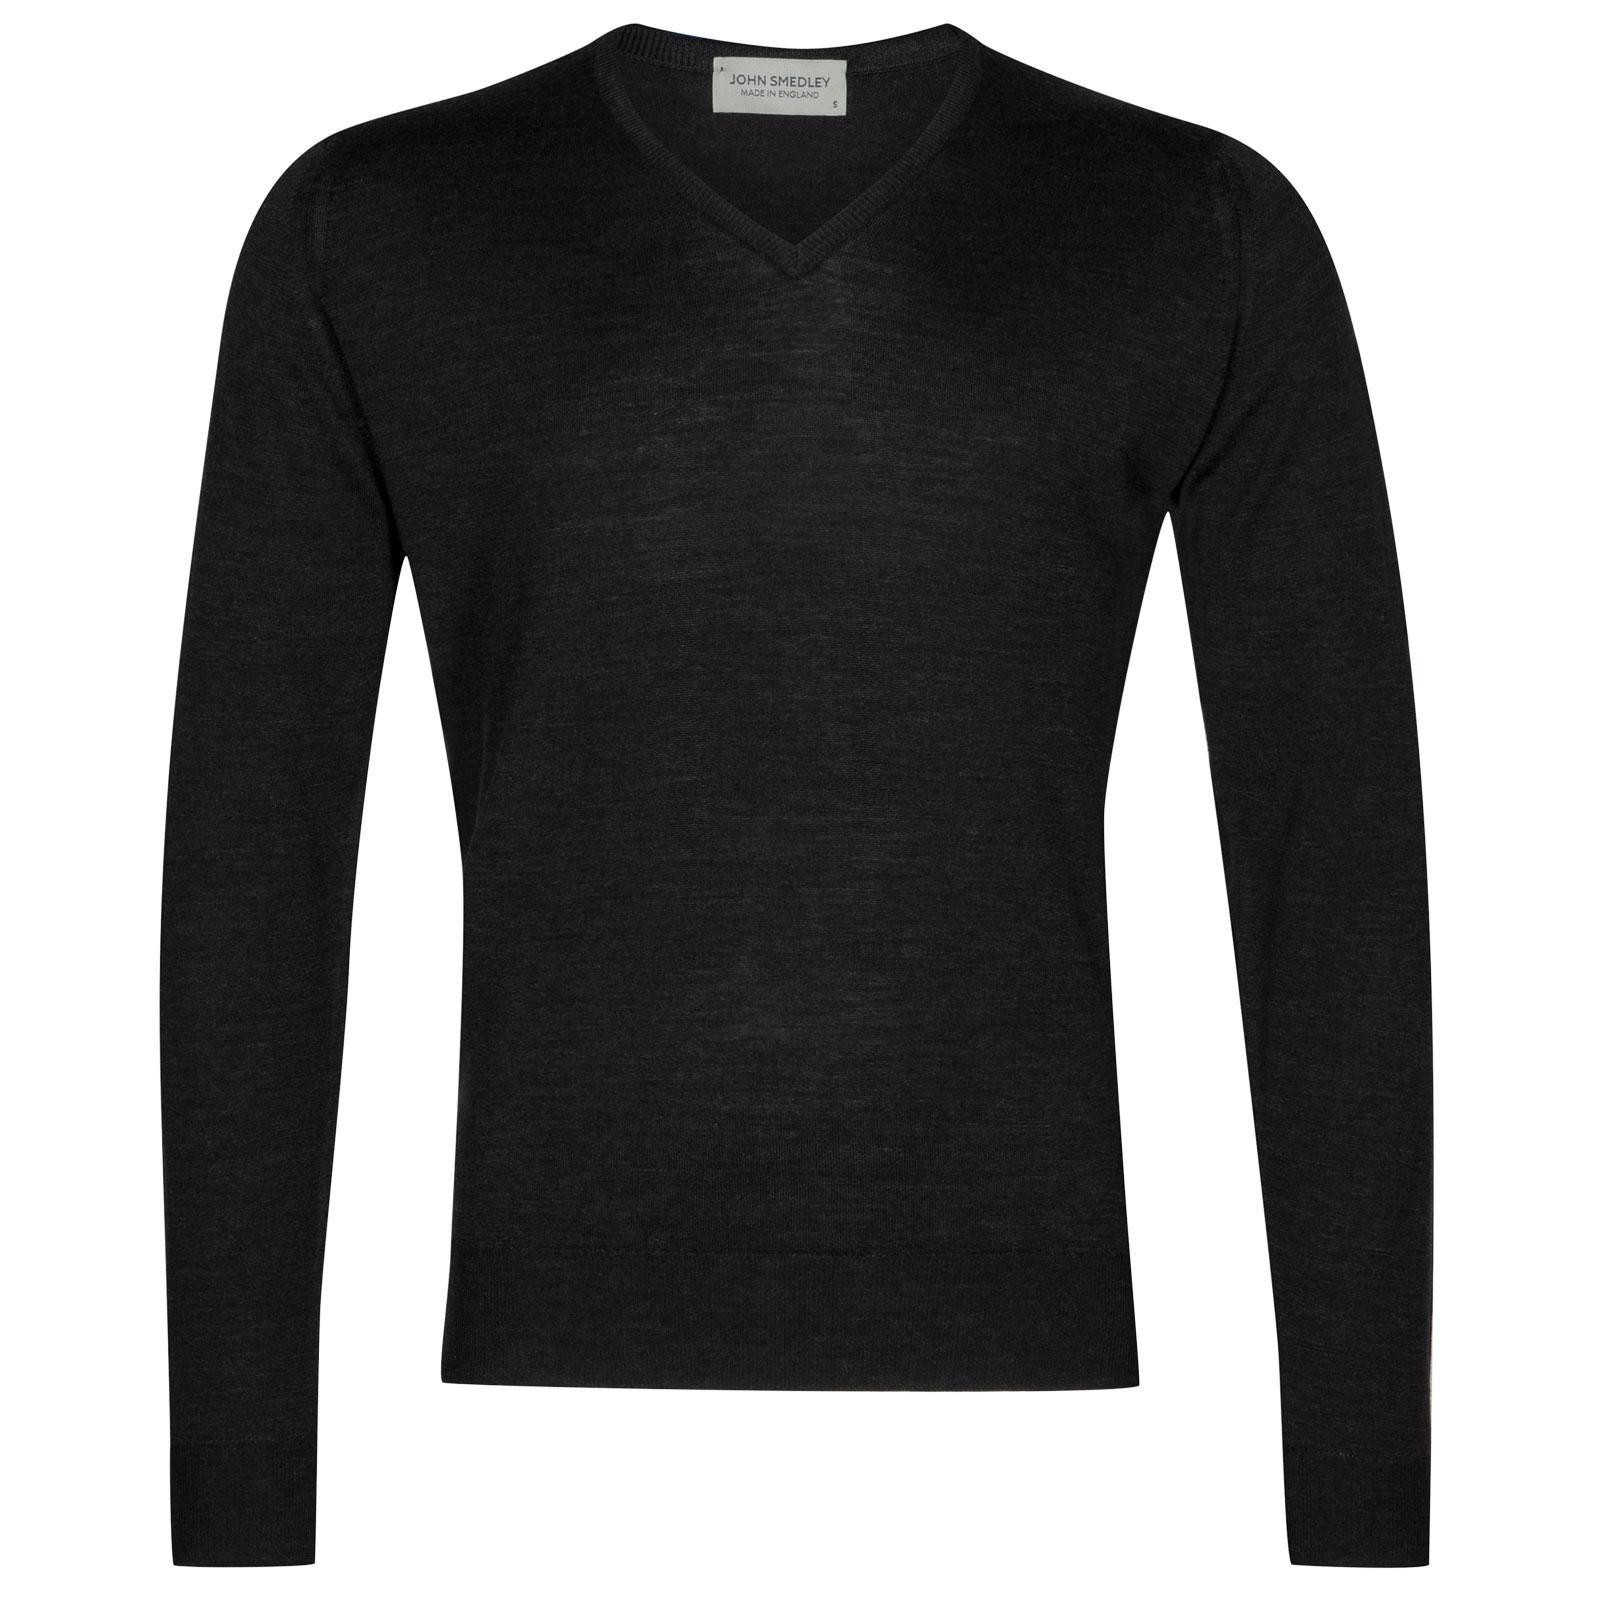 John Smedley Lugano Merino Wool Pullover in Hepburn Smoke-S